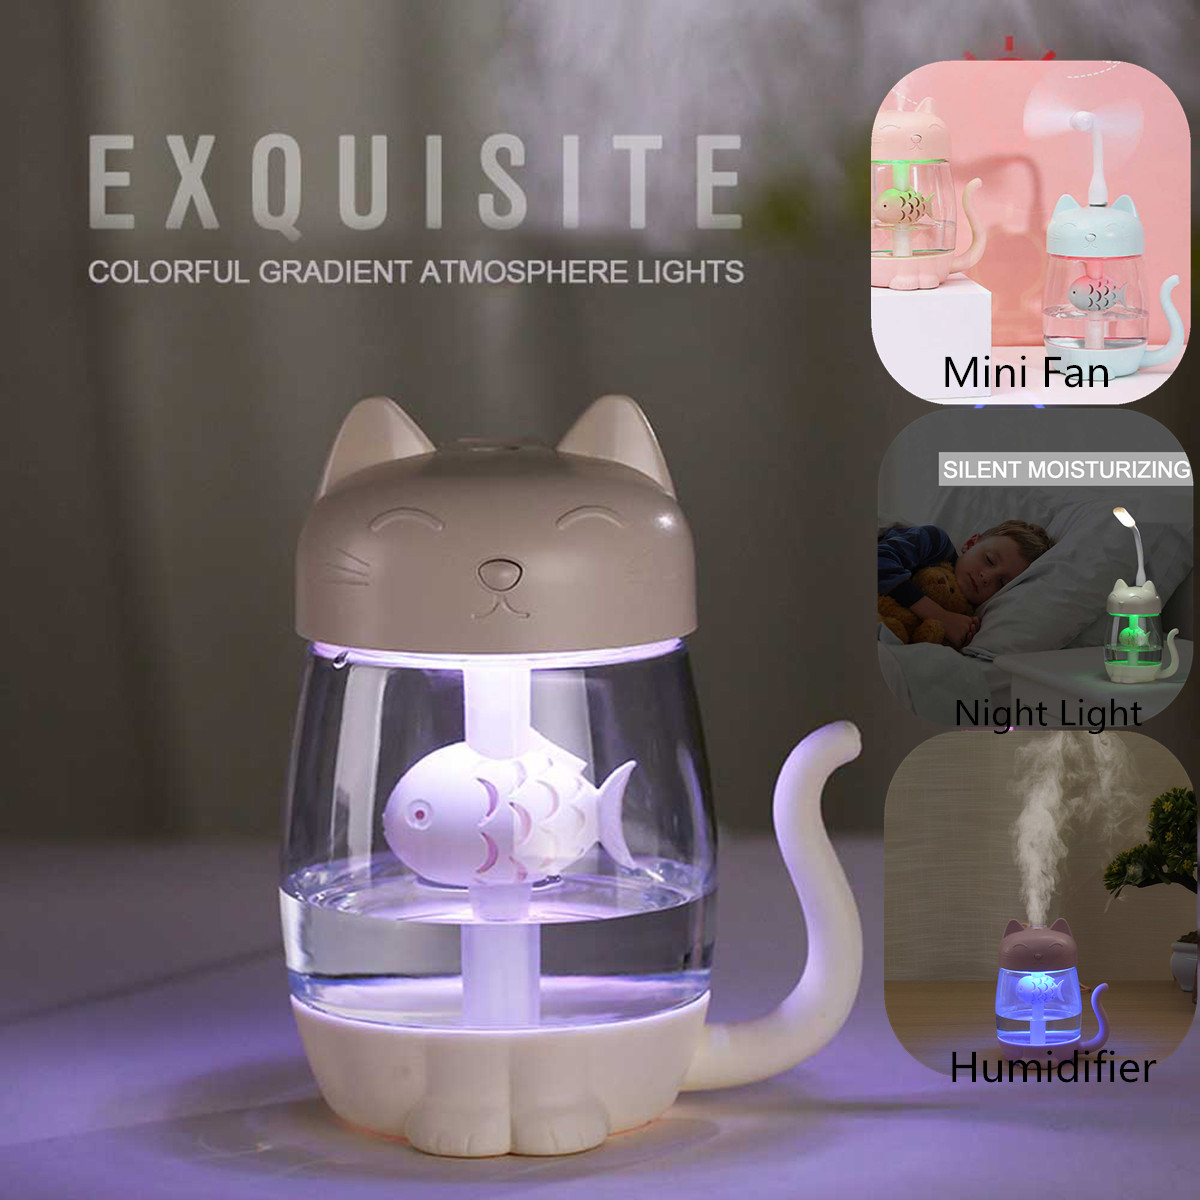 3 In 1 Ultrasonic Humidifier Essential Oil Diffuser Ultrasonic Air Humidifier 350ml Cat Cool Mist Mini Fan LED Night Light